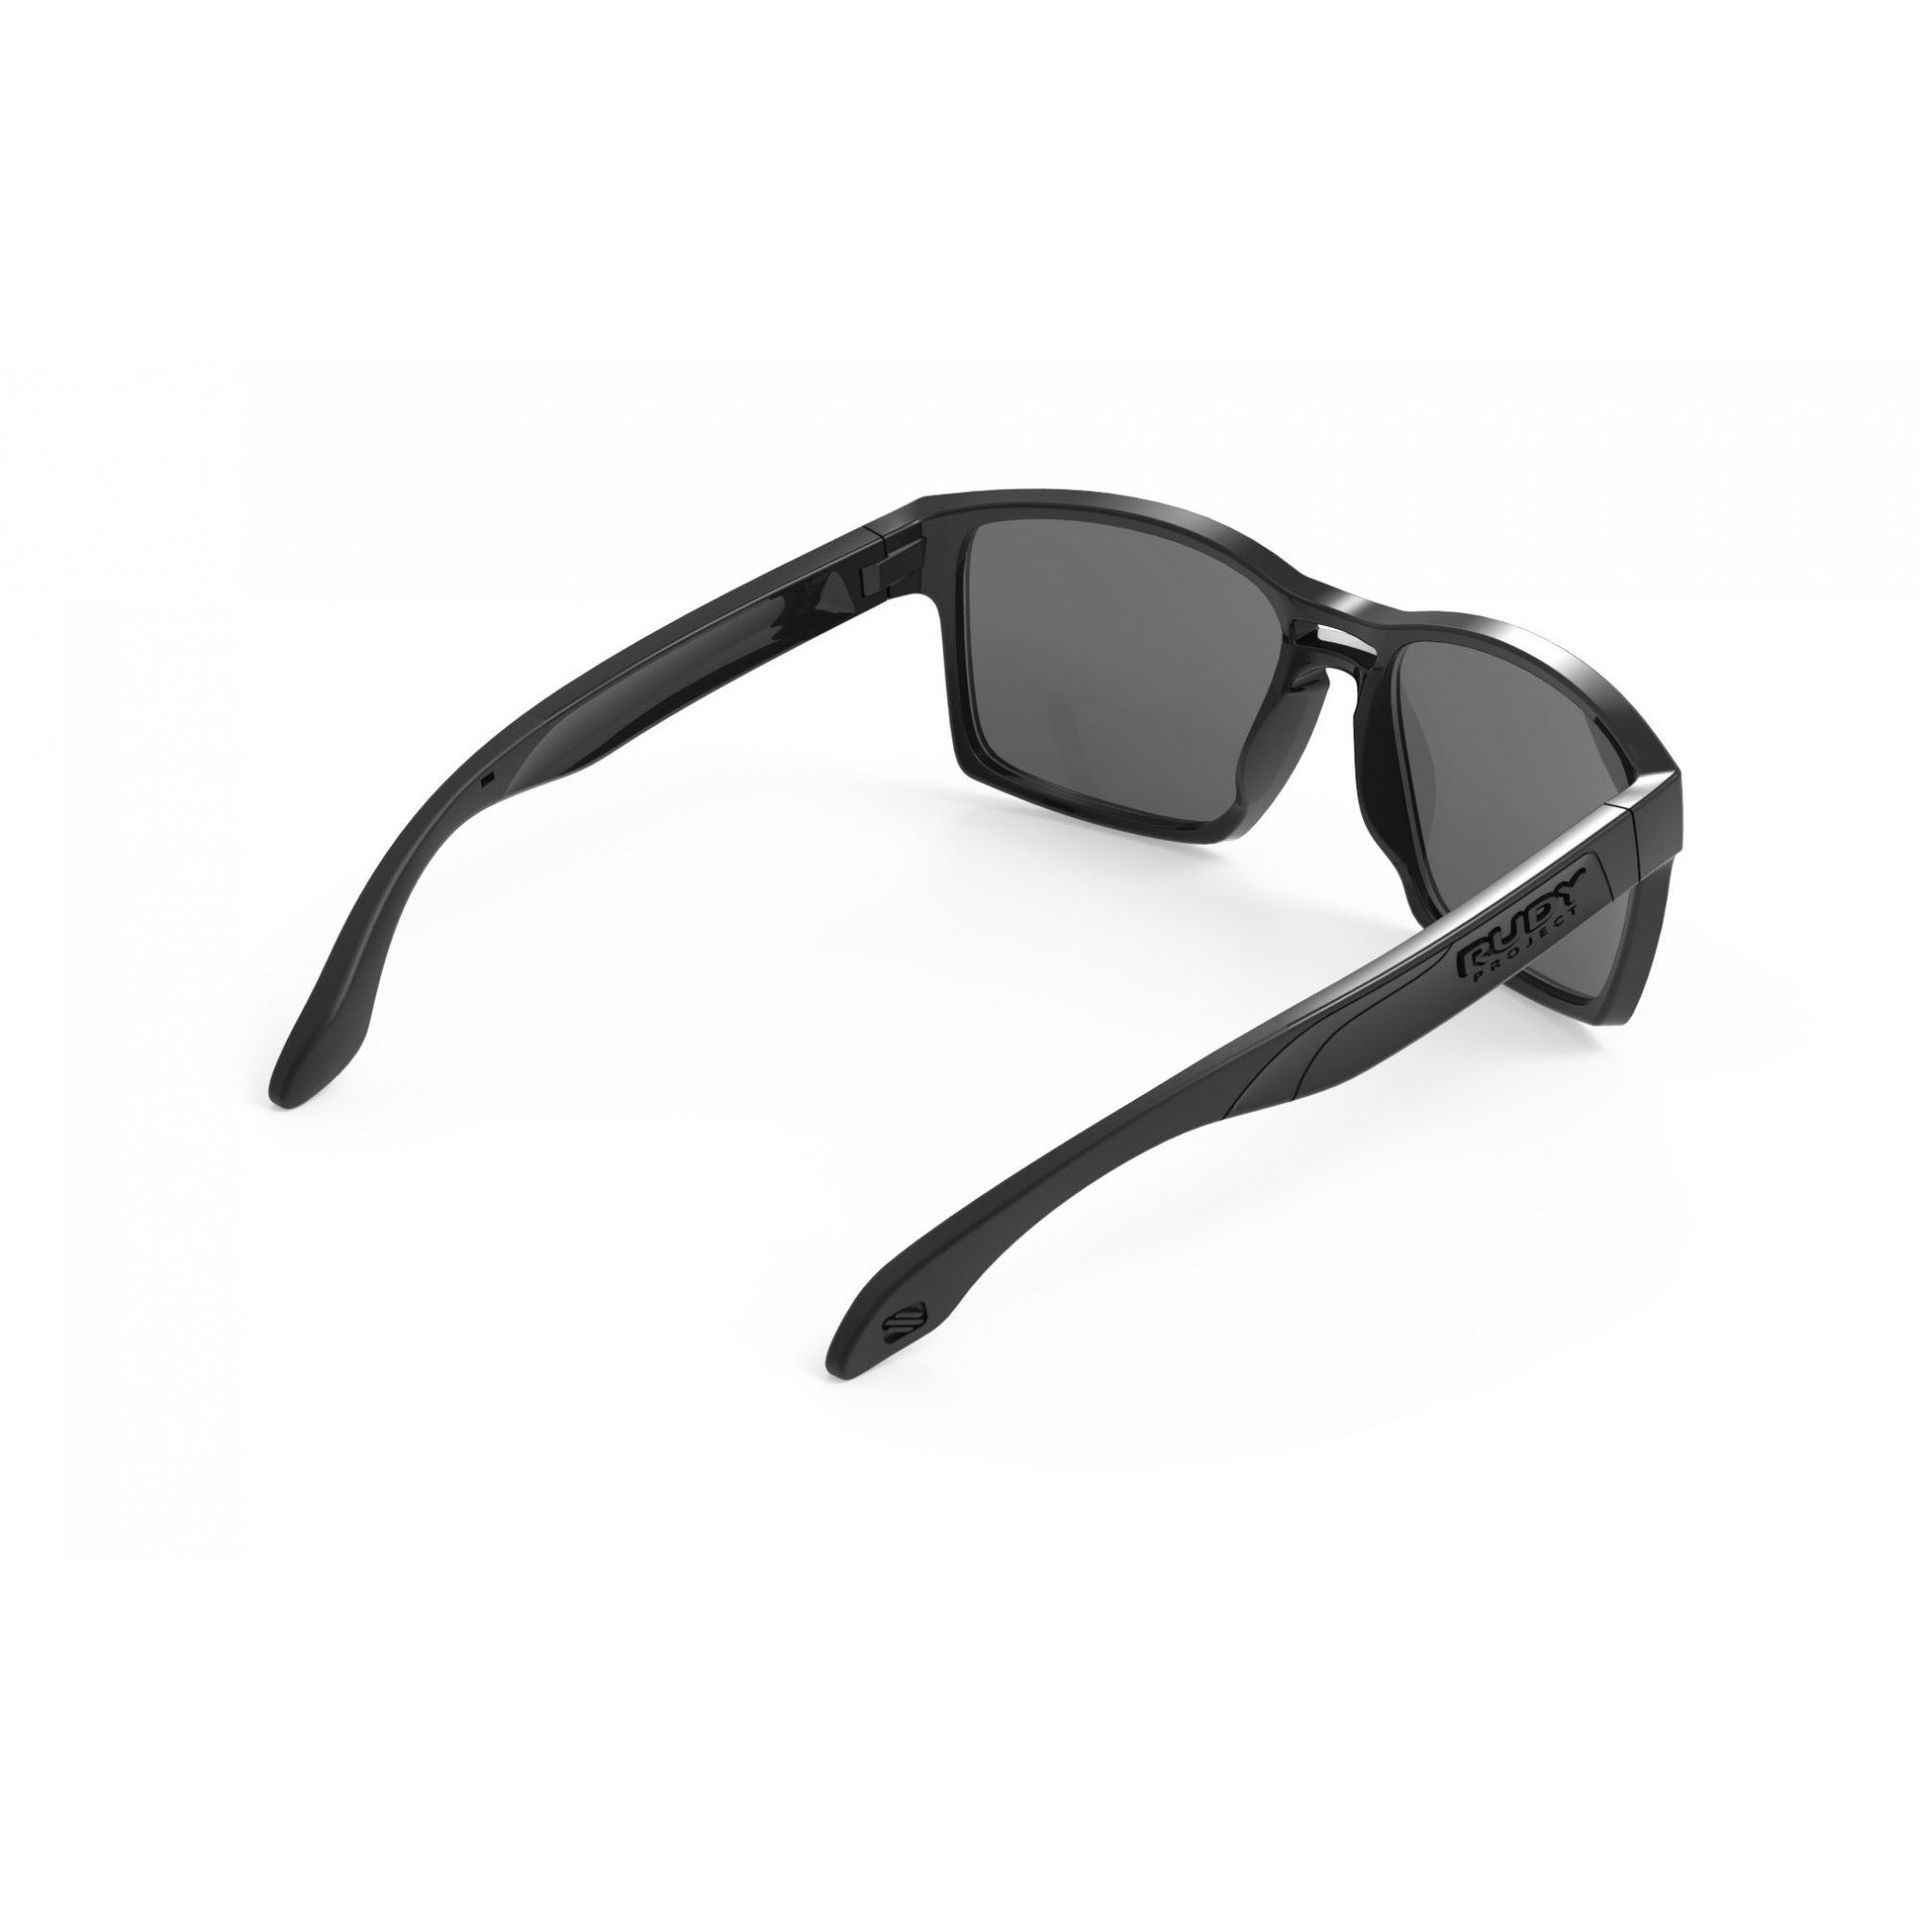 OKULARY RUDY PROJECT SPINAIR 57 BLACK + SMOKE BLACK SP571042 5